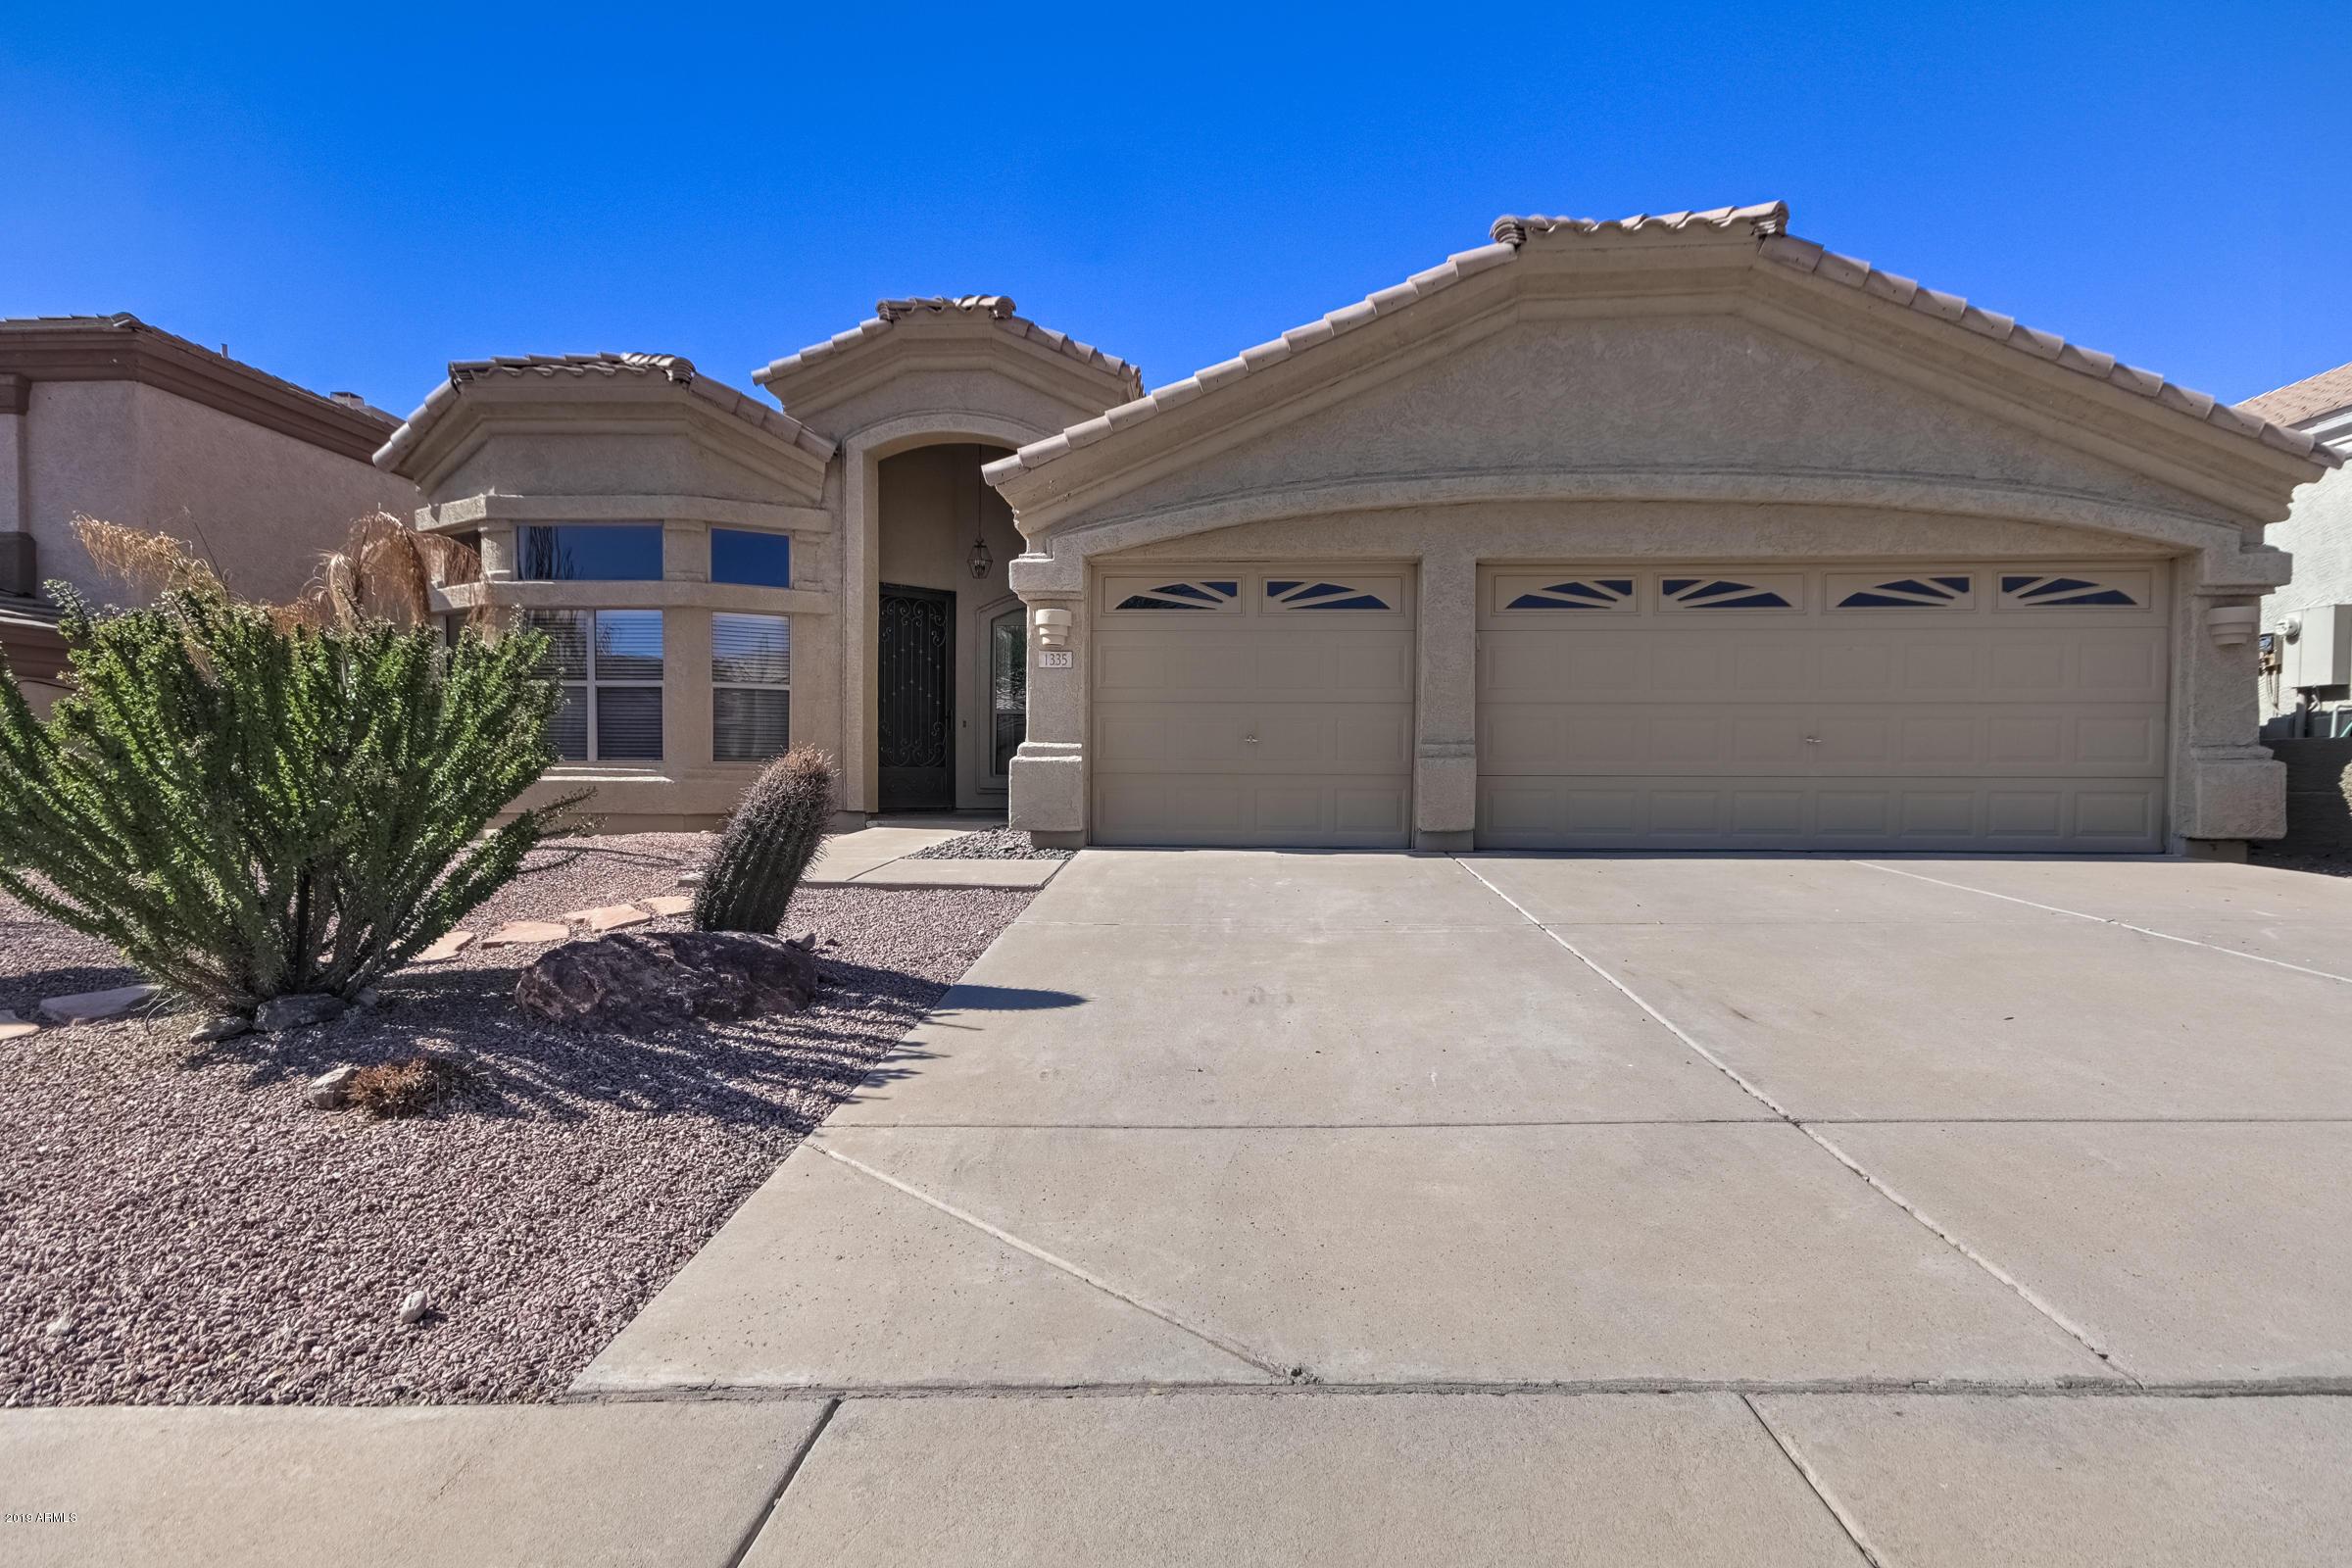 Photo of 1335 E REDWOOD Lane, Phoenix, AZ 85048